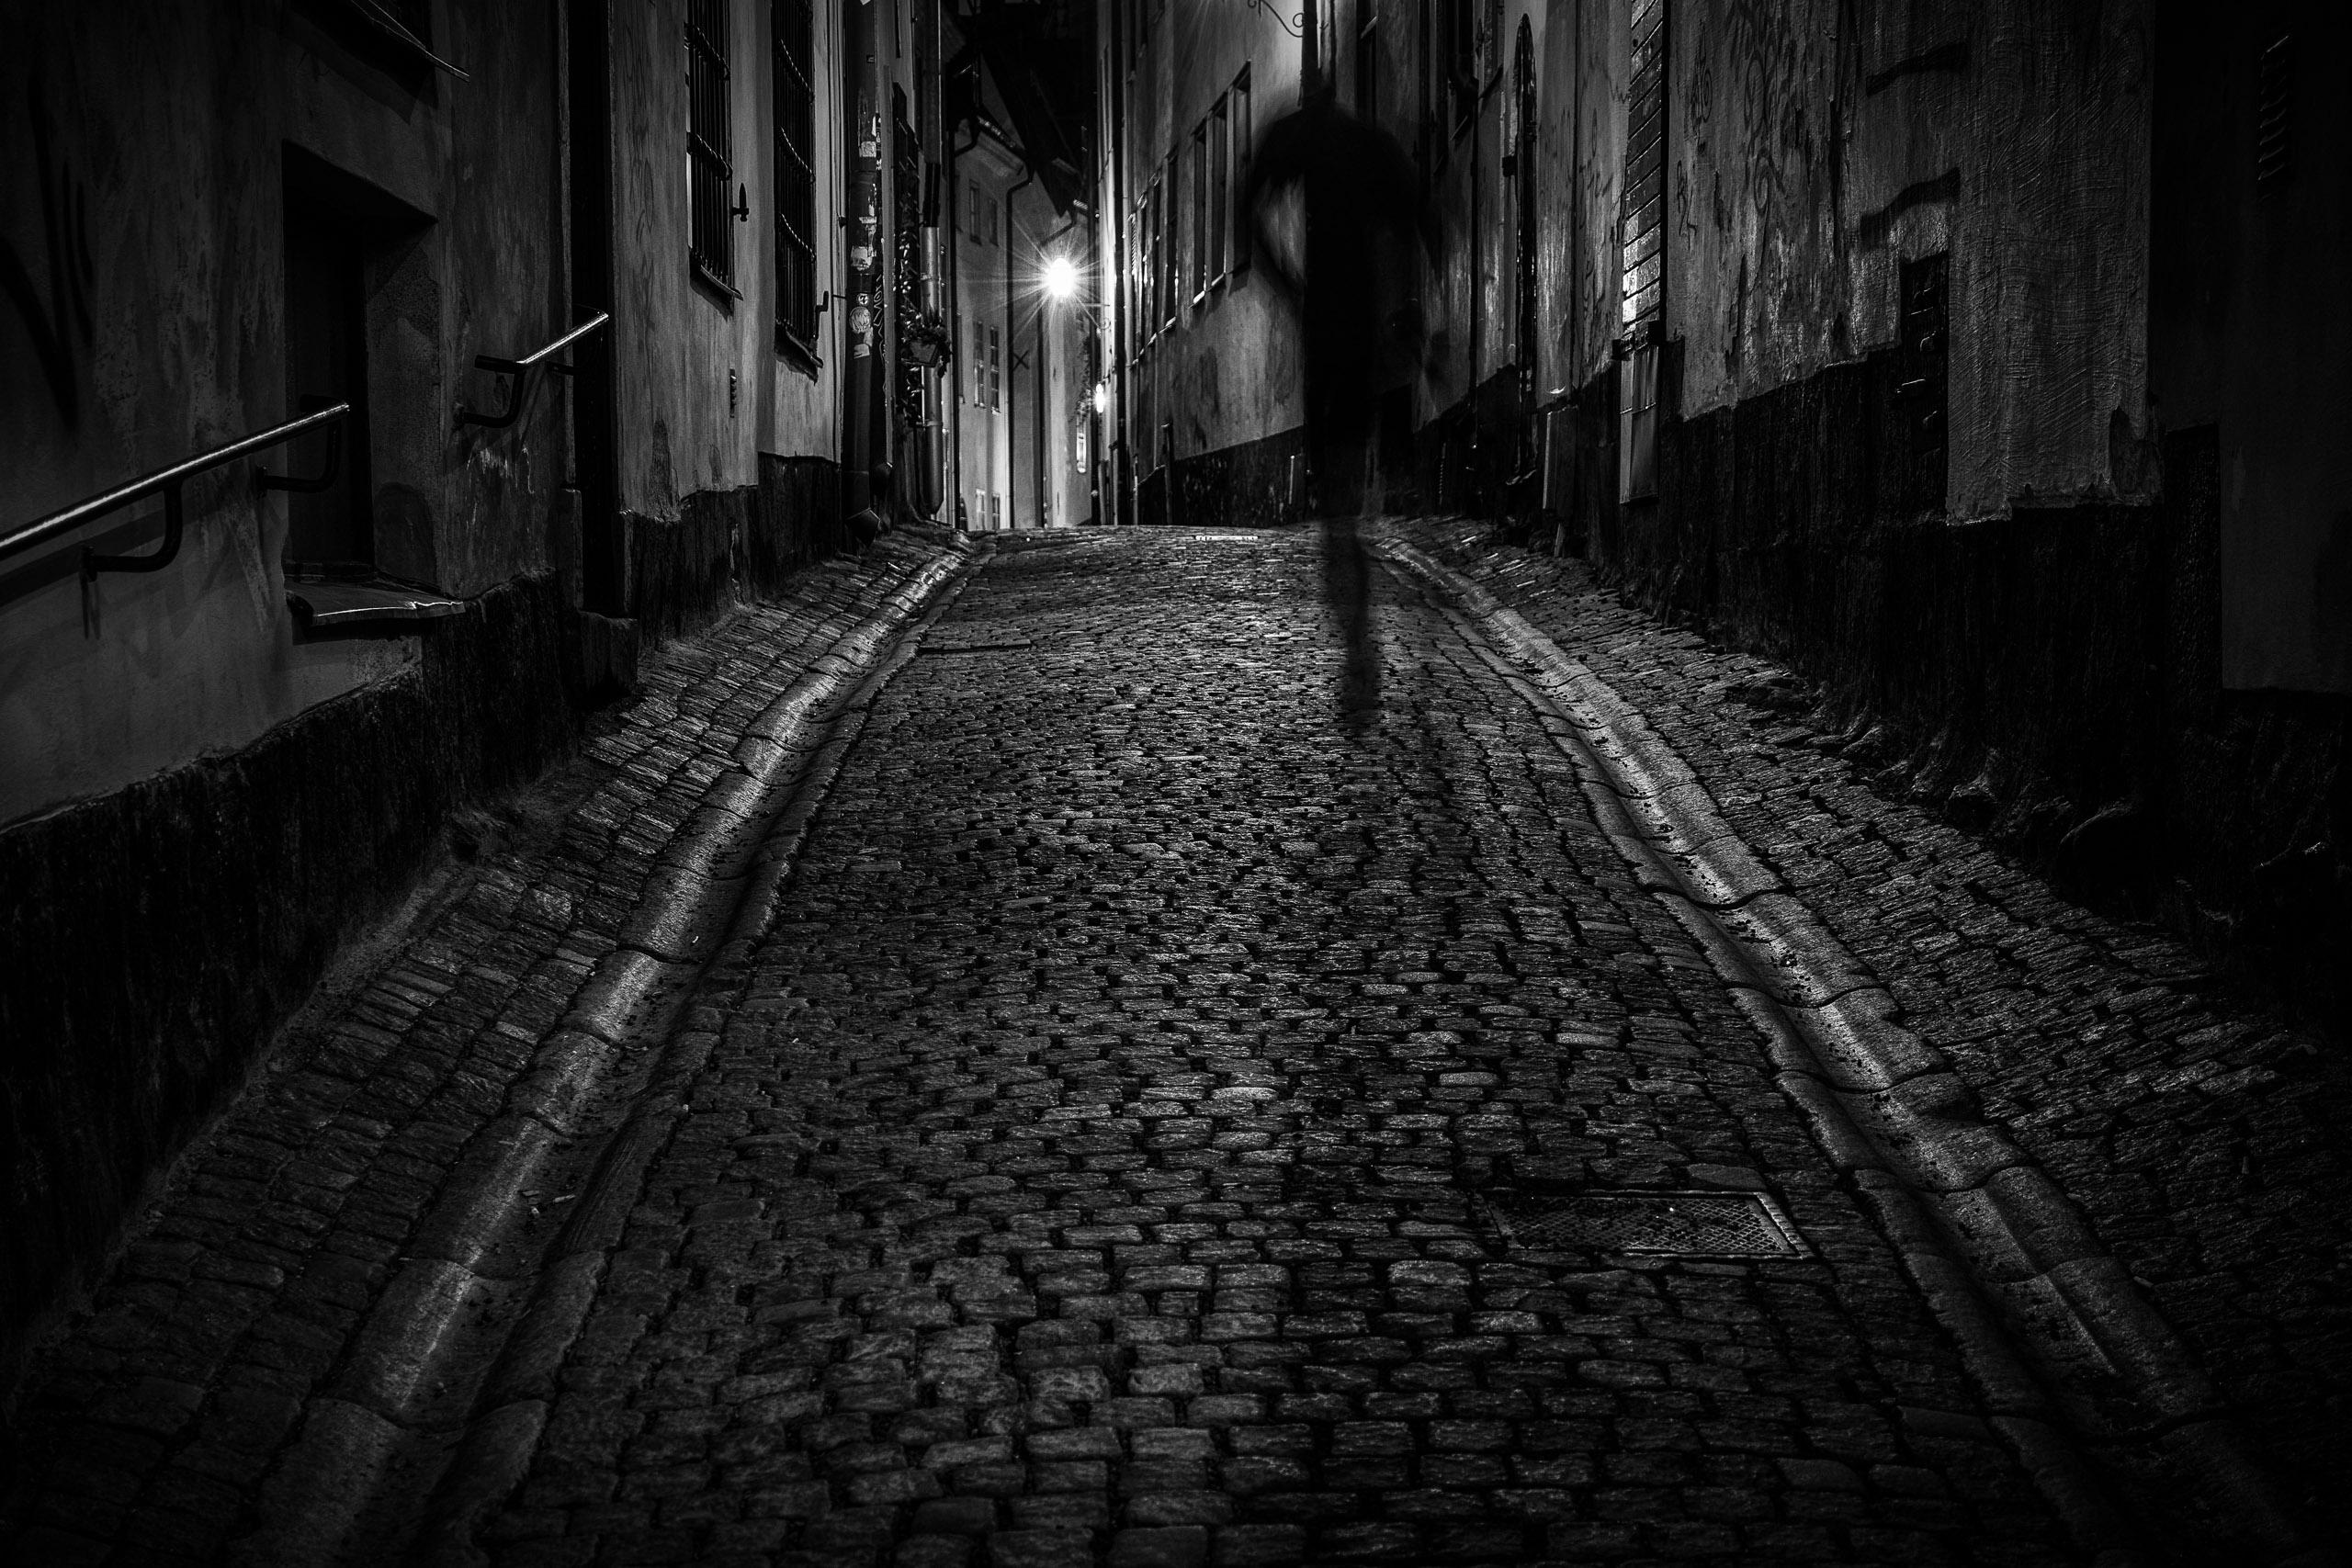 Wallpaper Dark City Street Night Architecture Cobblestone Urban Sky Stones Shadow Bricks Silhouette Evening Lamp Gloomy Texture